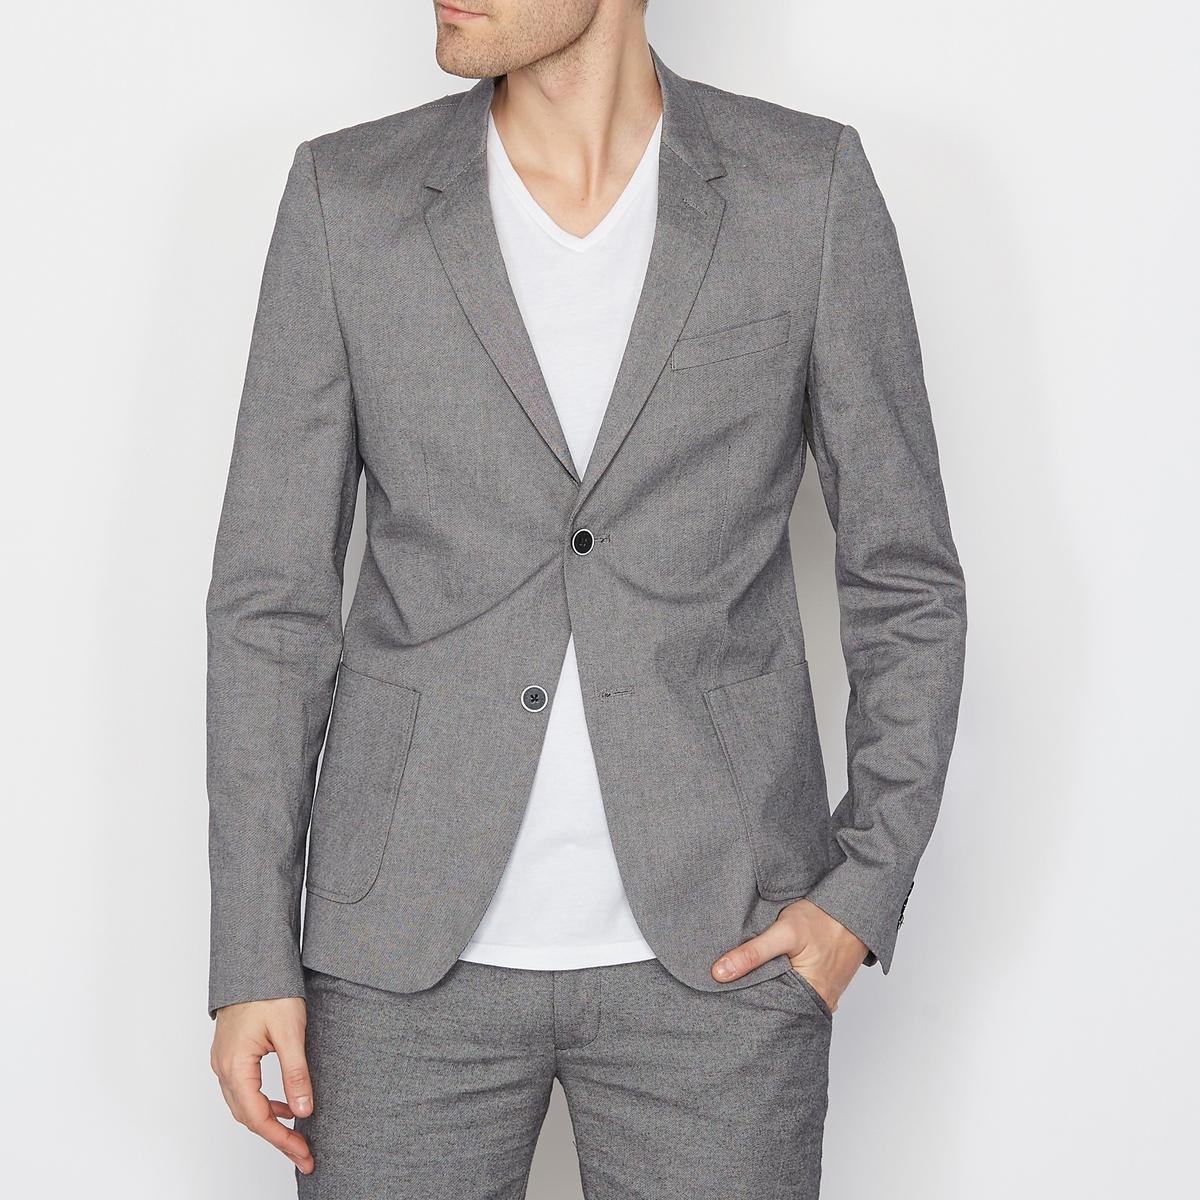 Блейзер с карманами, рукава с пуговицами SOFT GREY